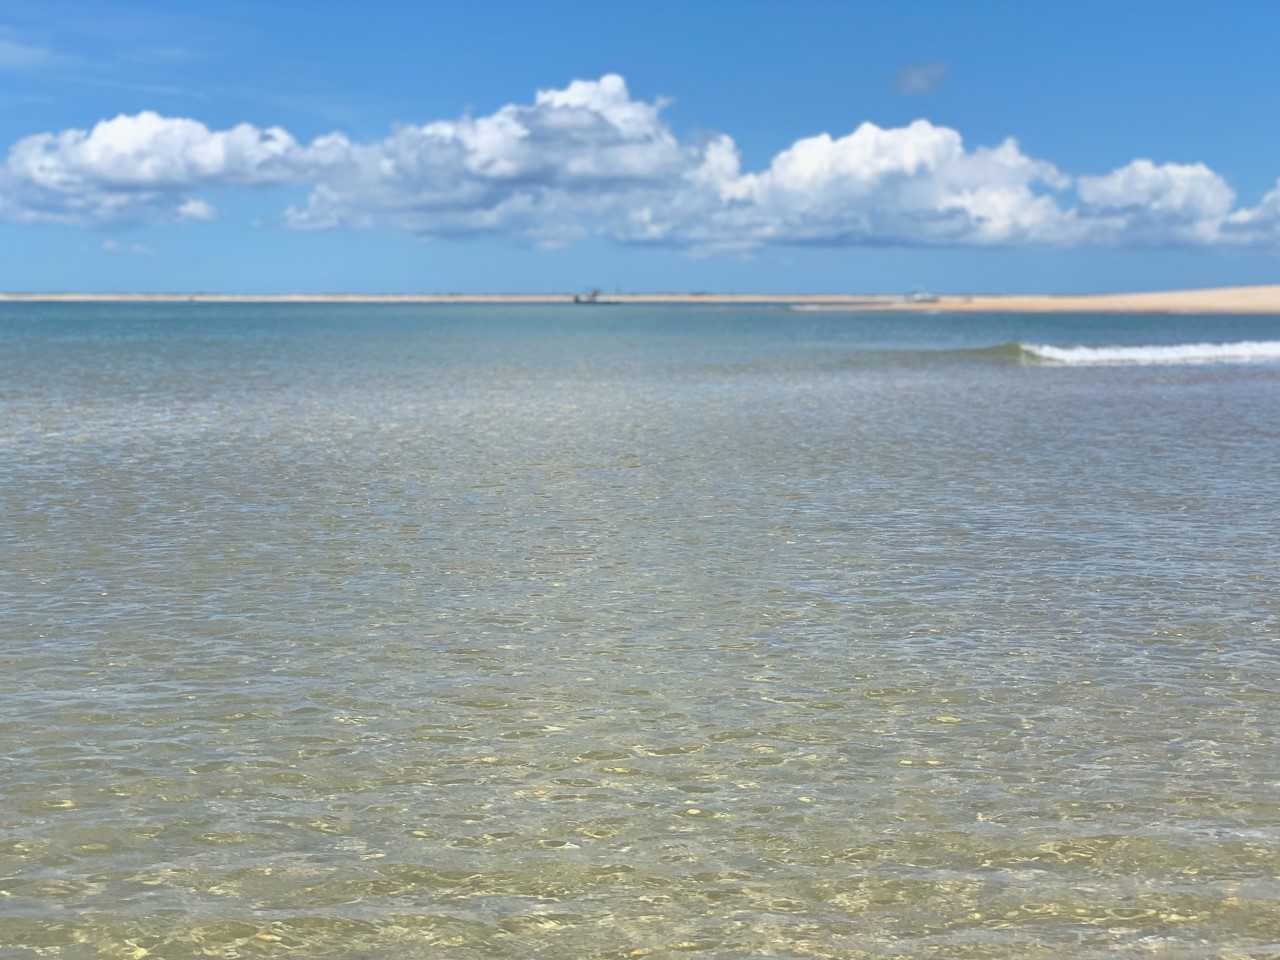 Crystal clear Caribbean water near Ocracoke Island, NC.